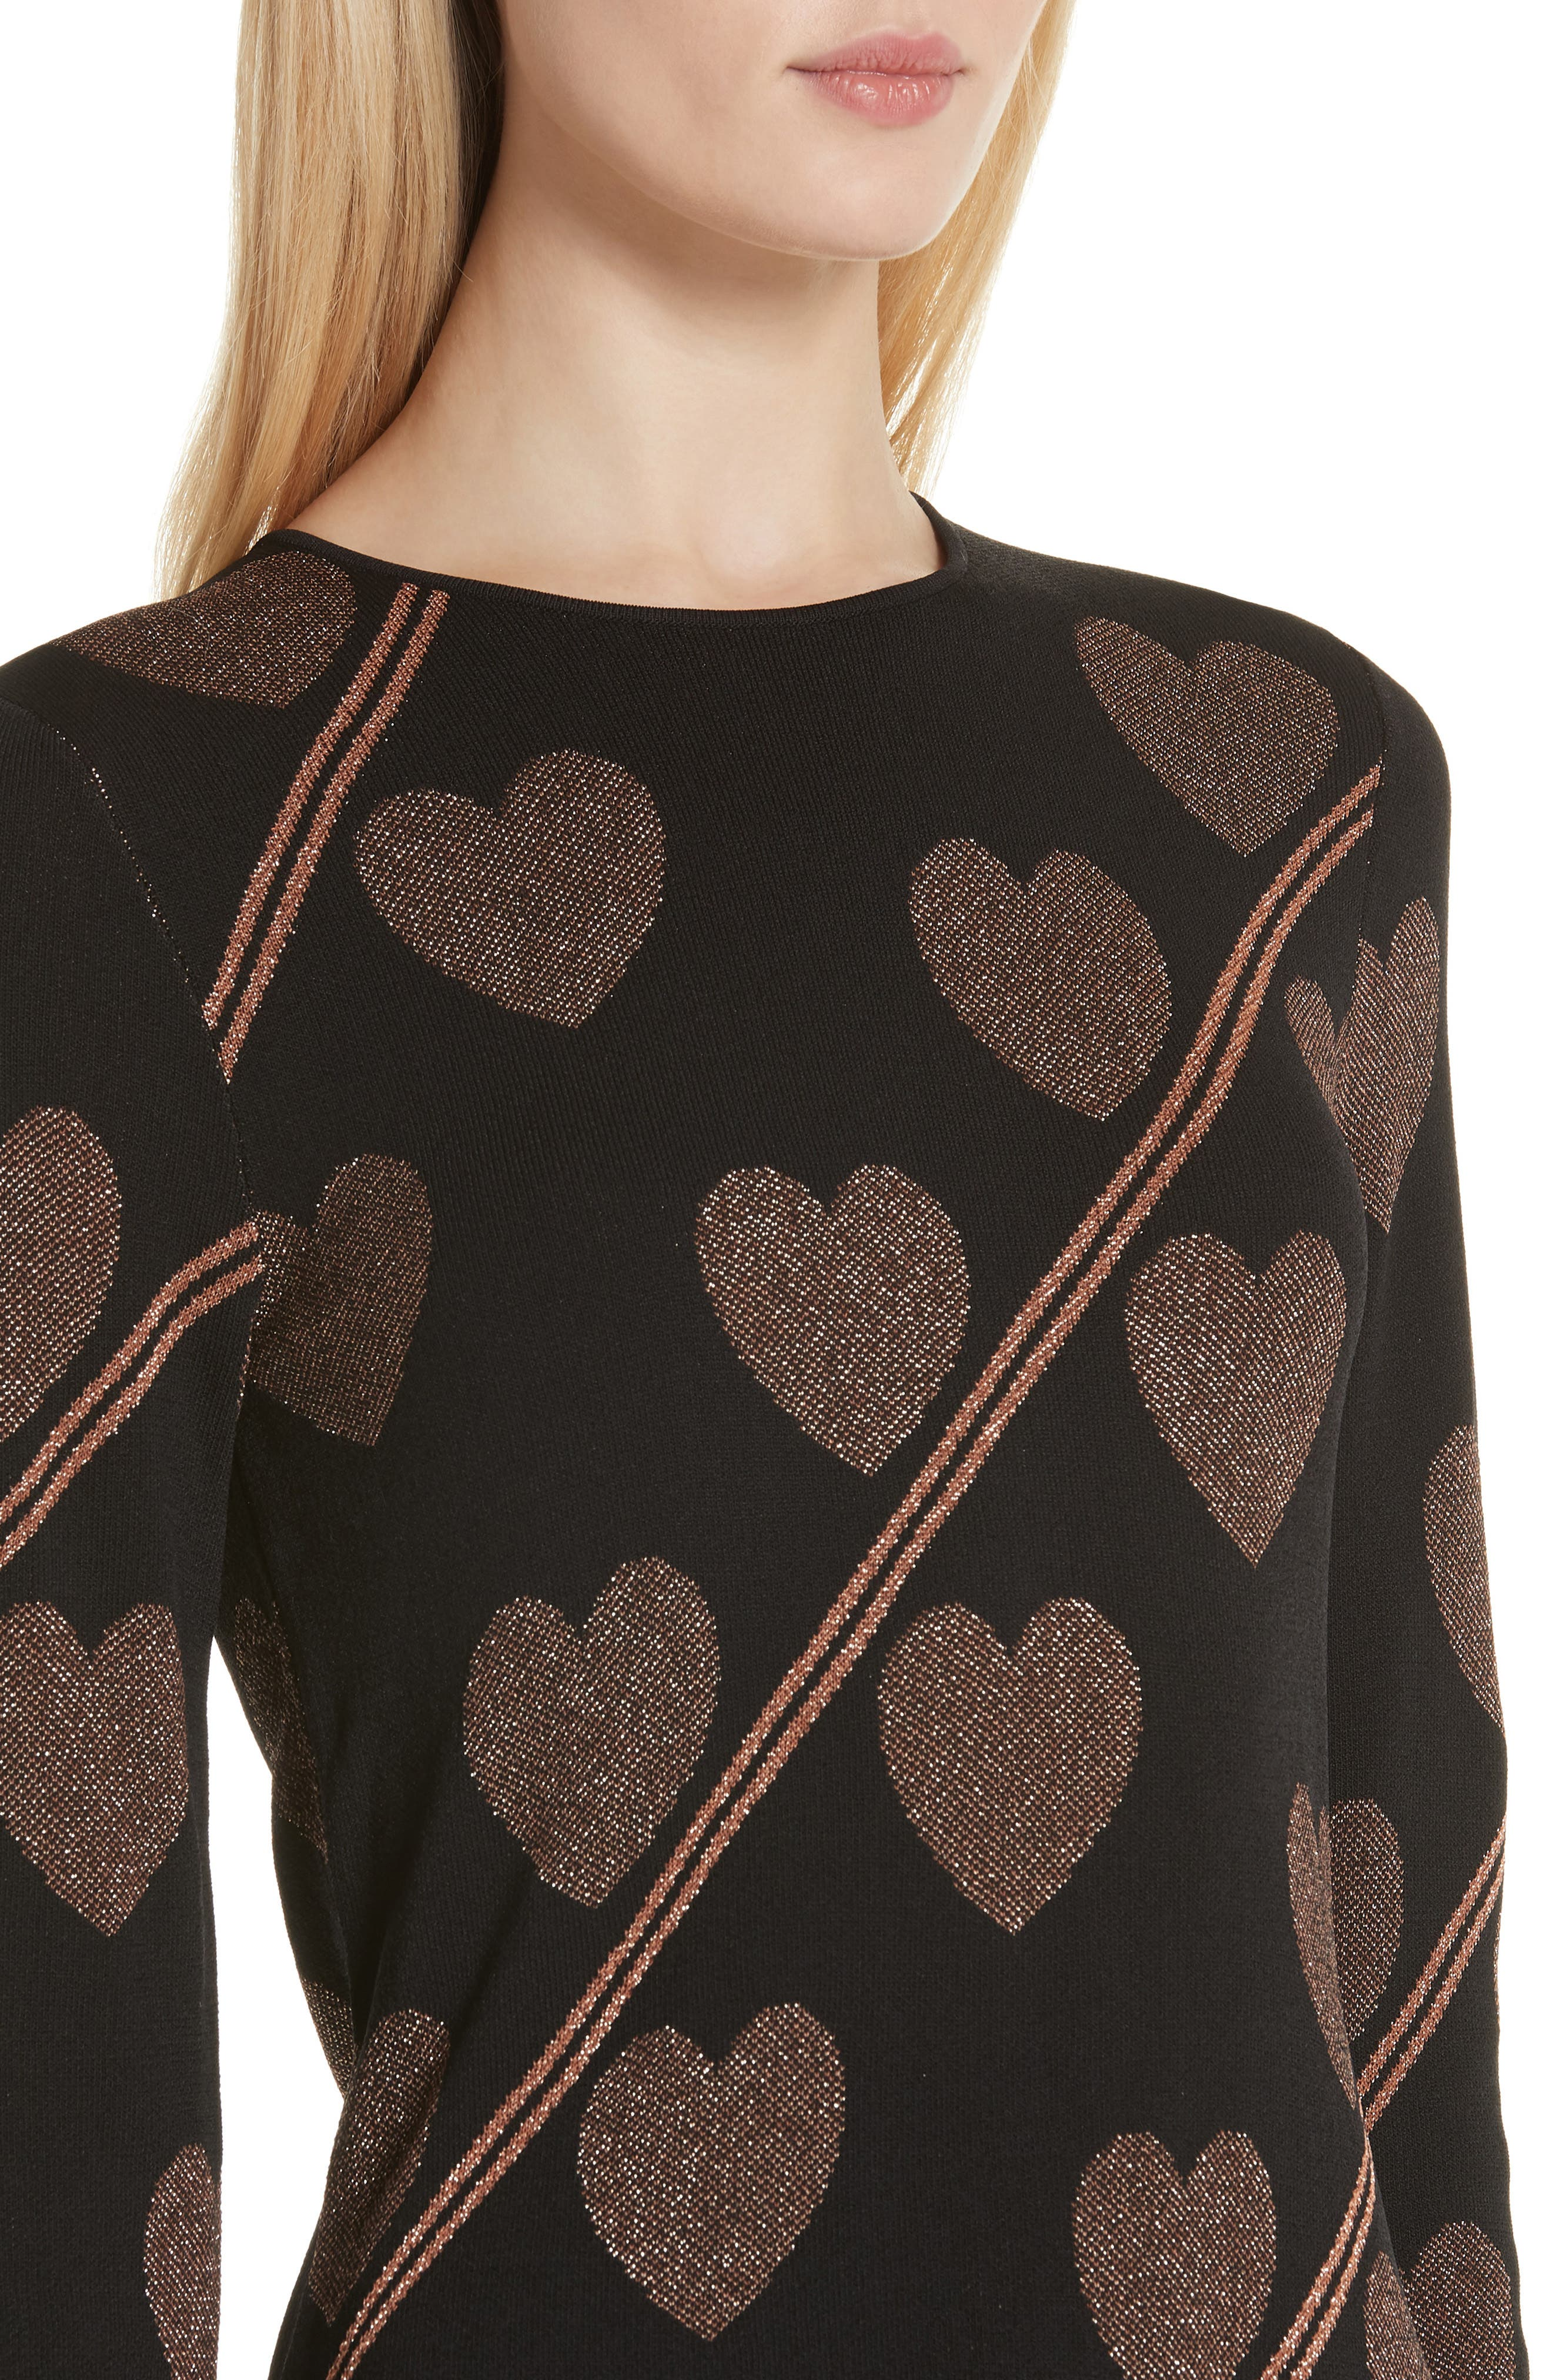 Uzeniaa Joyous Sweater Dress,                             Alternate thumbnail 4, color,                             BLACK